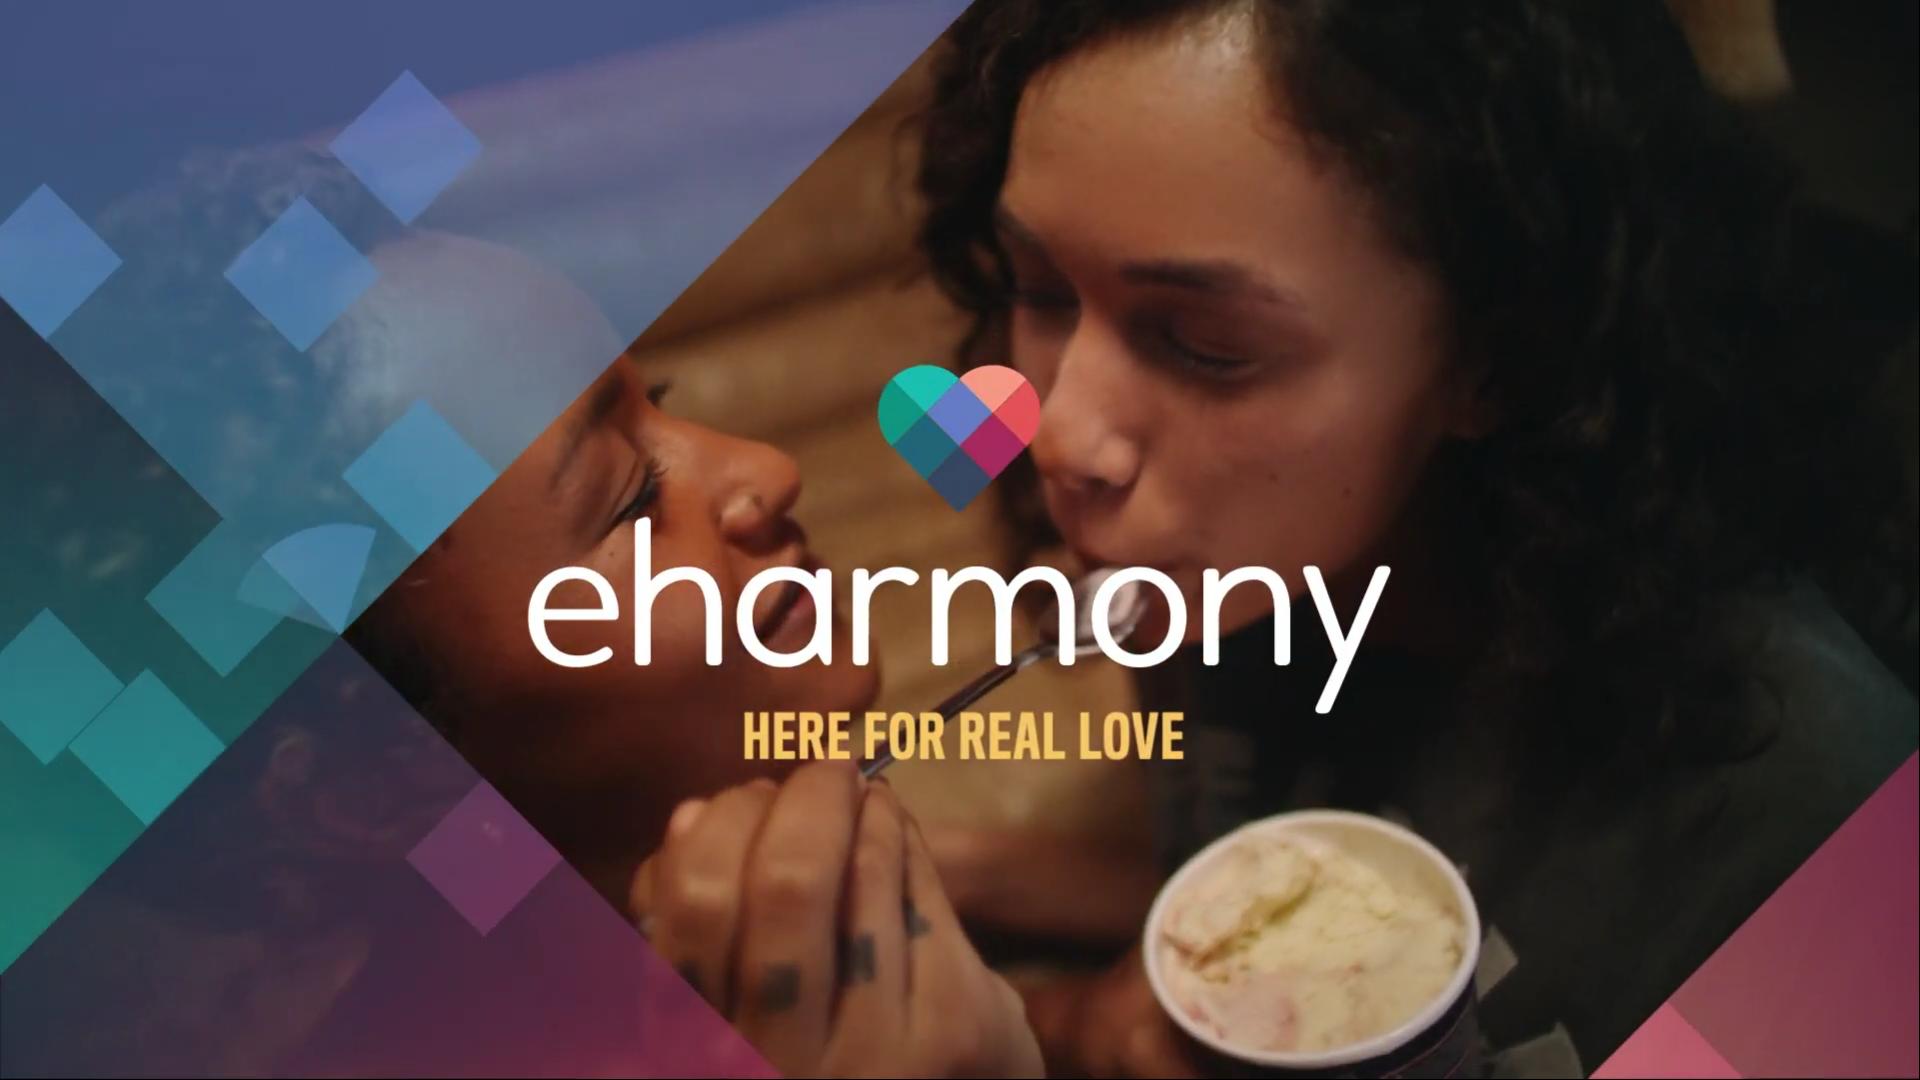 eharmony Accused of 'Brainwashing' Children For Advert Featuring Same-Sex Couple